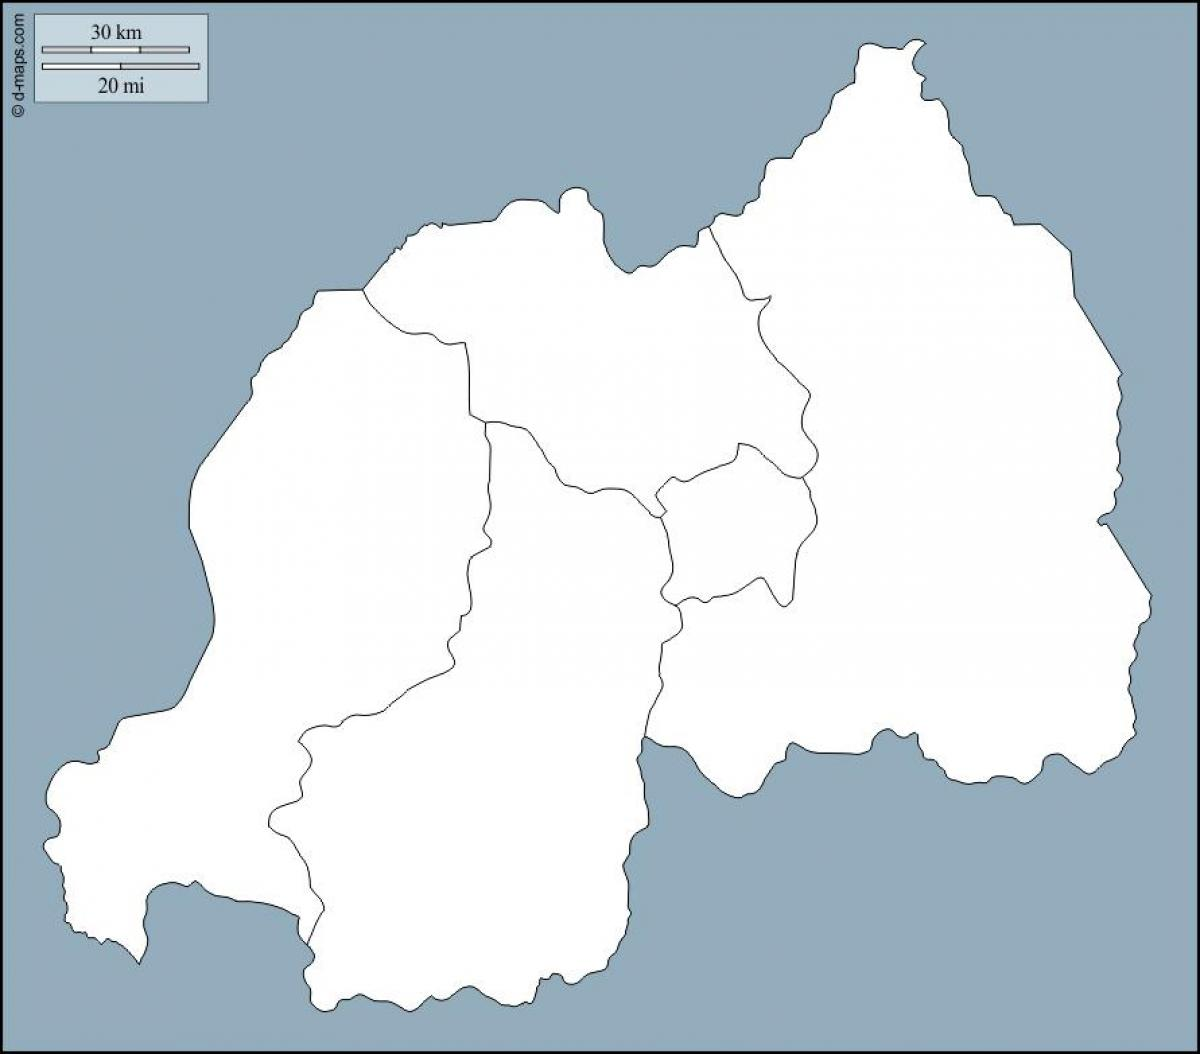 Rwanda map - Rwanda map outline (Eastern Africa - Africa)